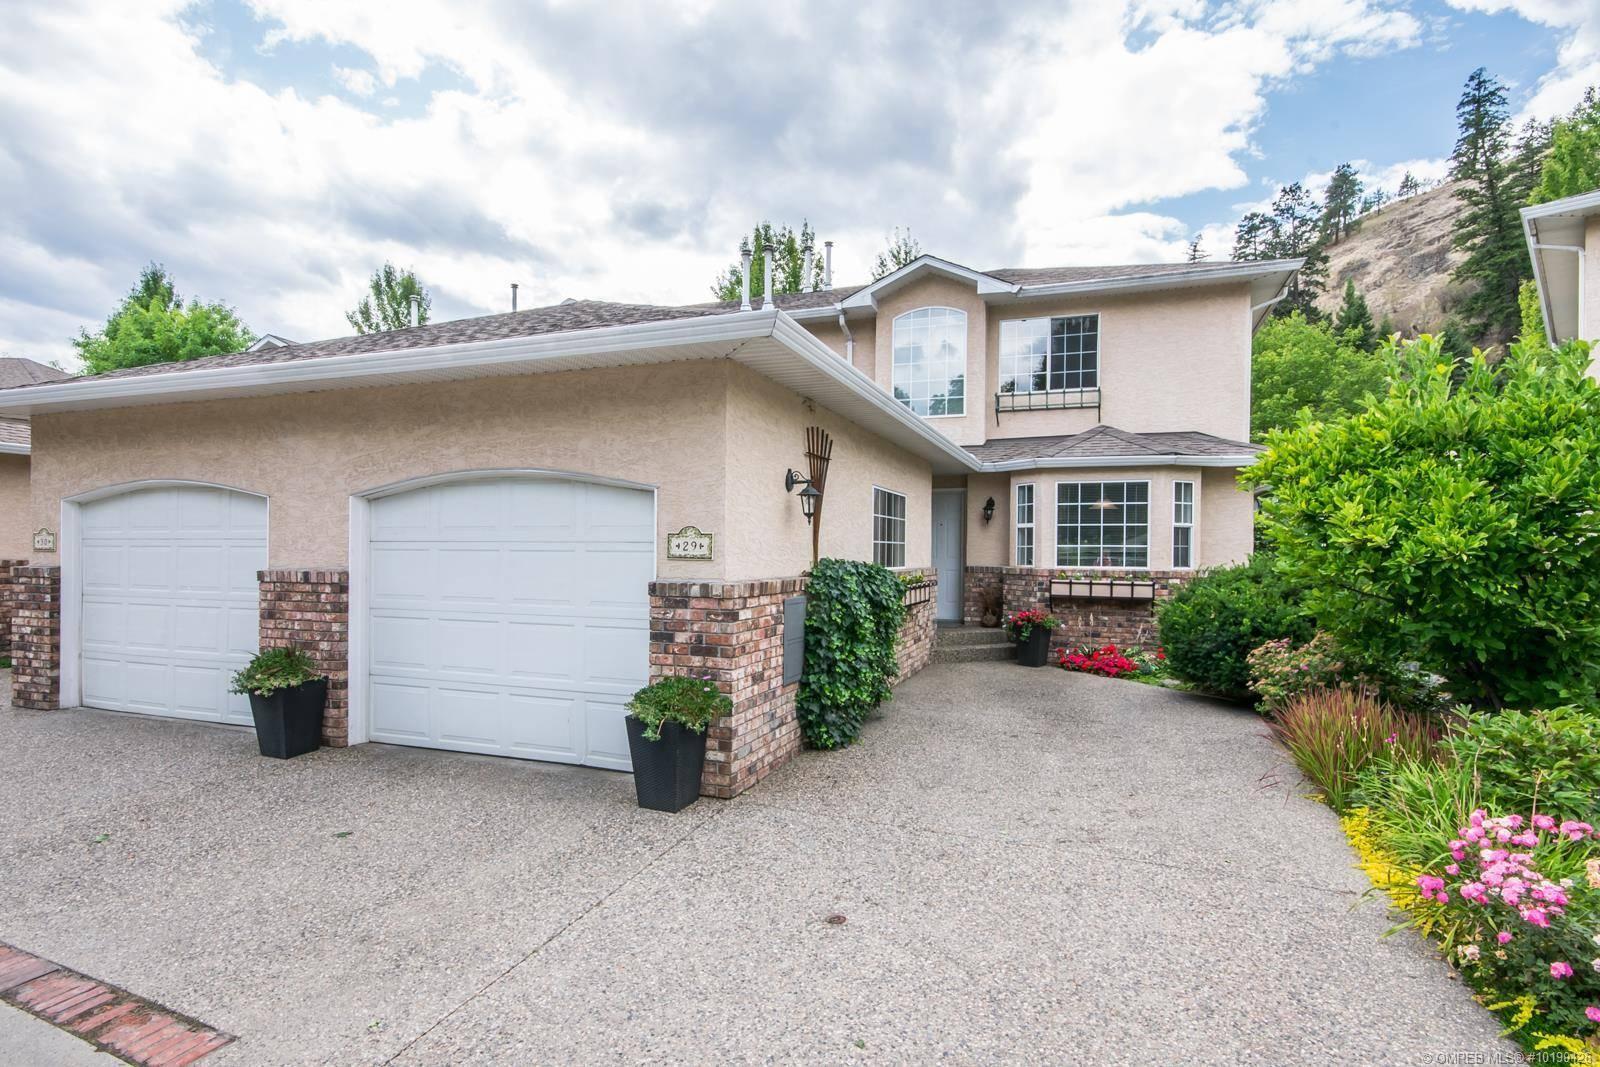 Townhouse for sale at 527 Yates Rd Unit 29 Kelowna British Columbia - MLS: 10190126